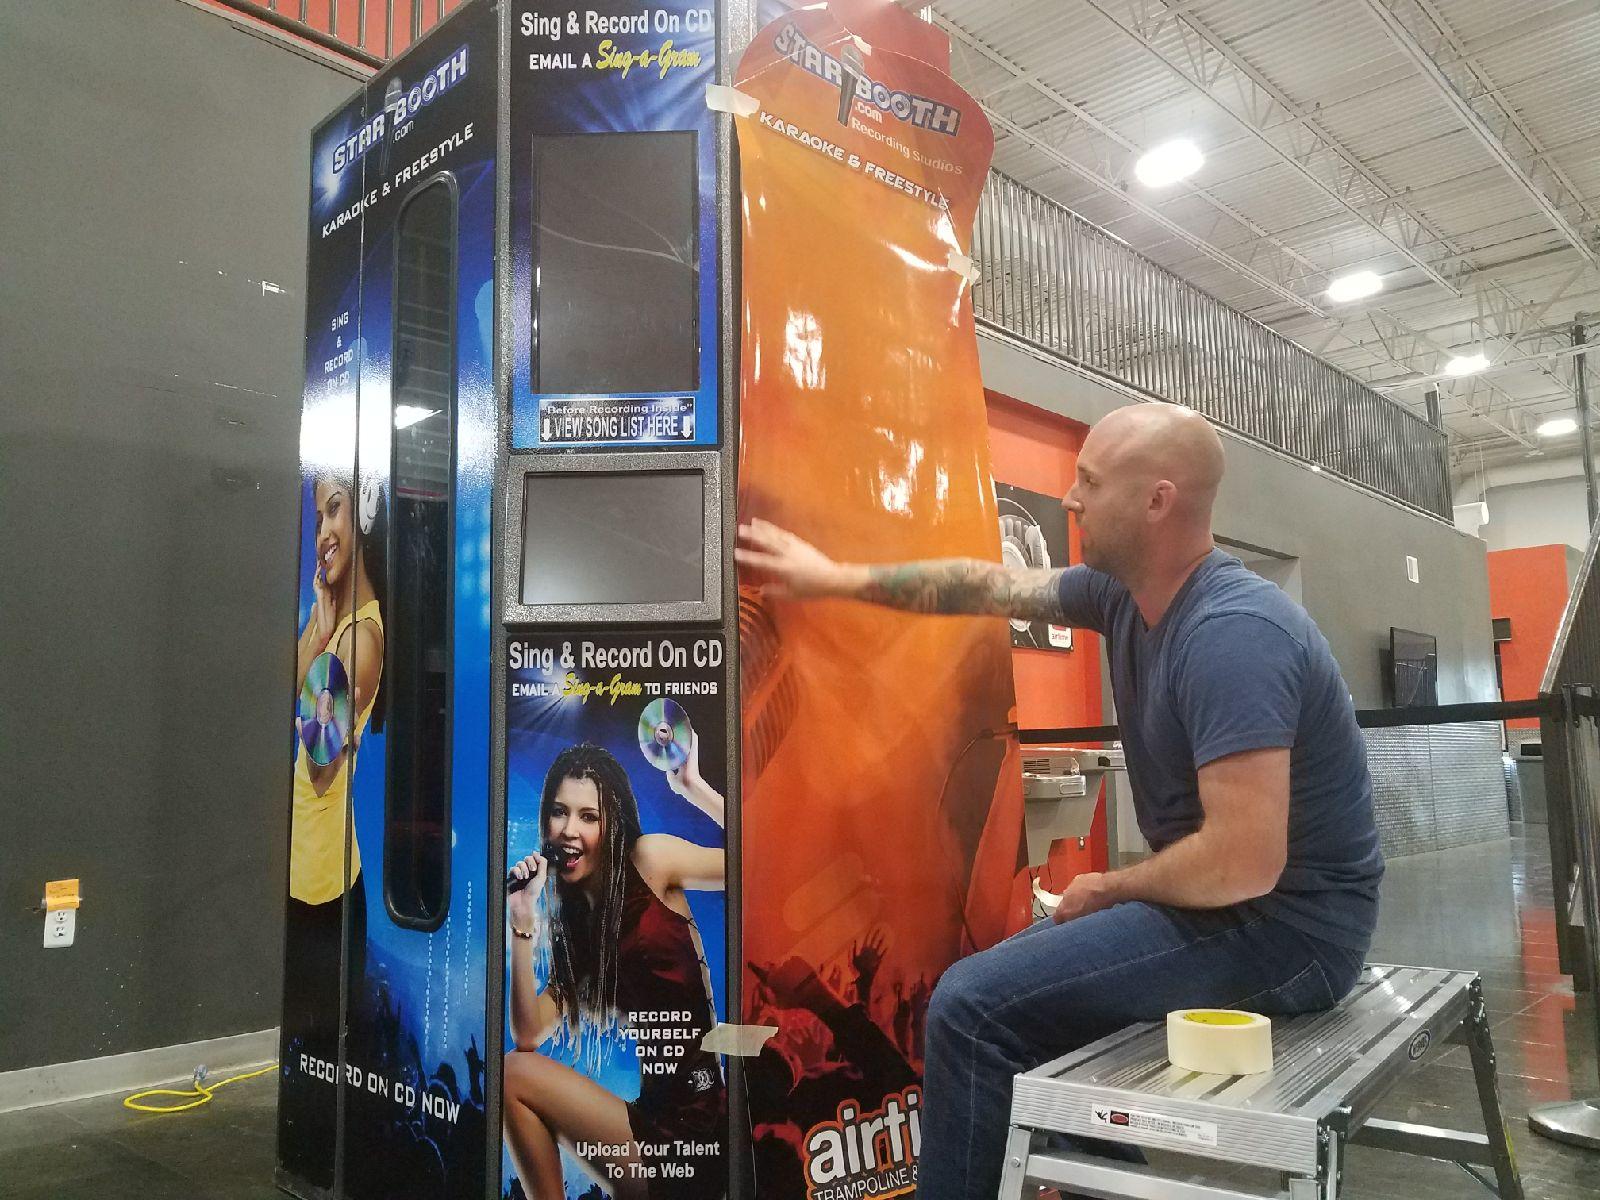 Airtime Karaoke Booth - before